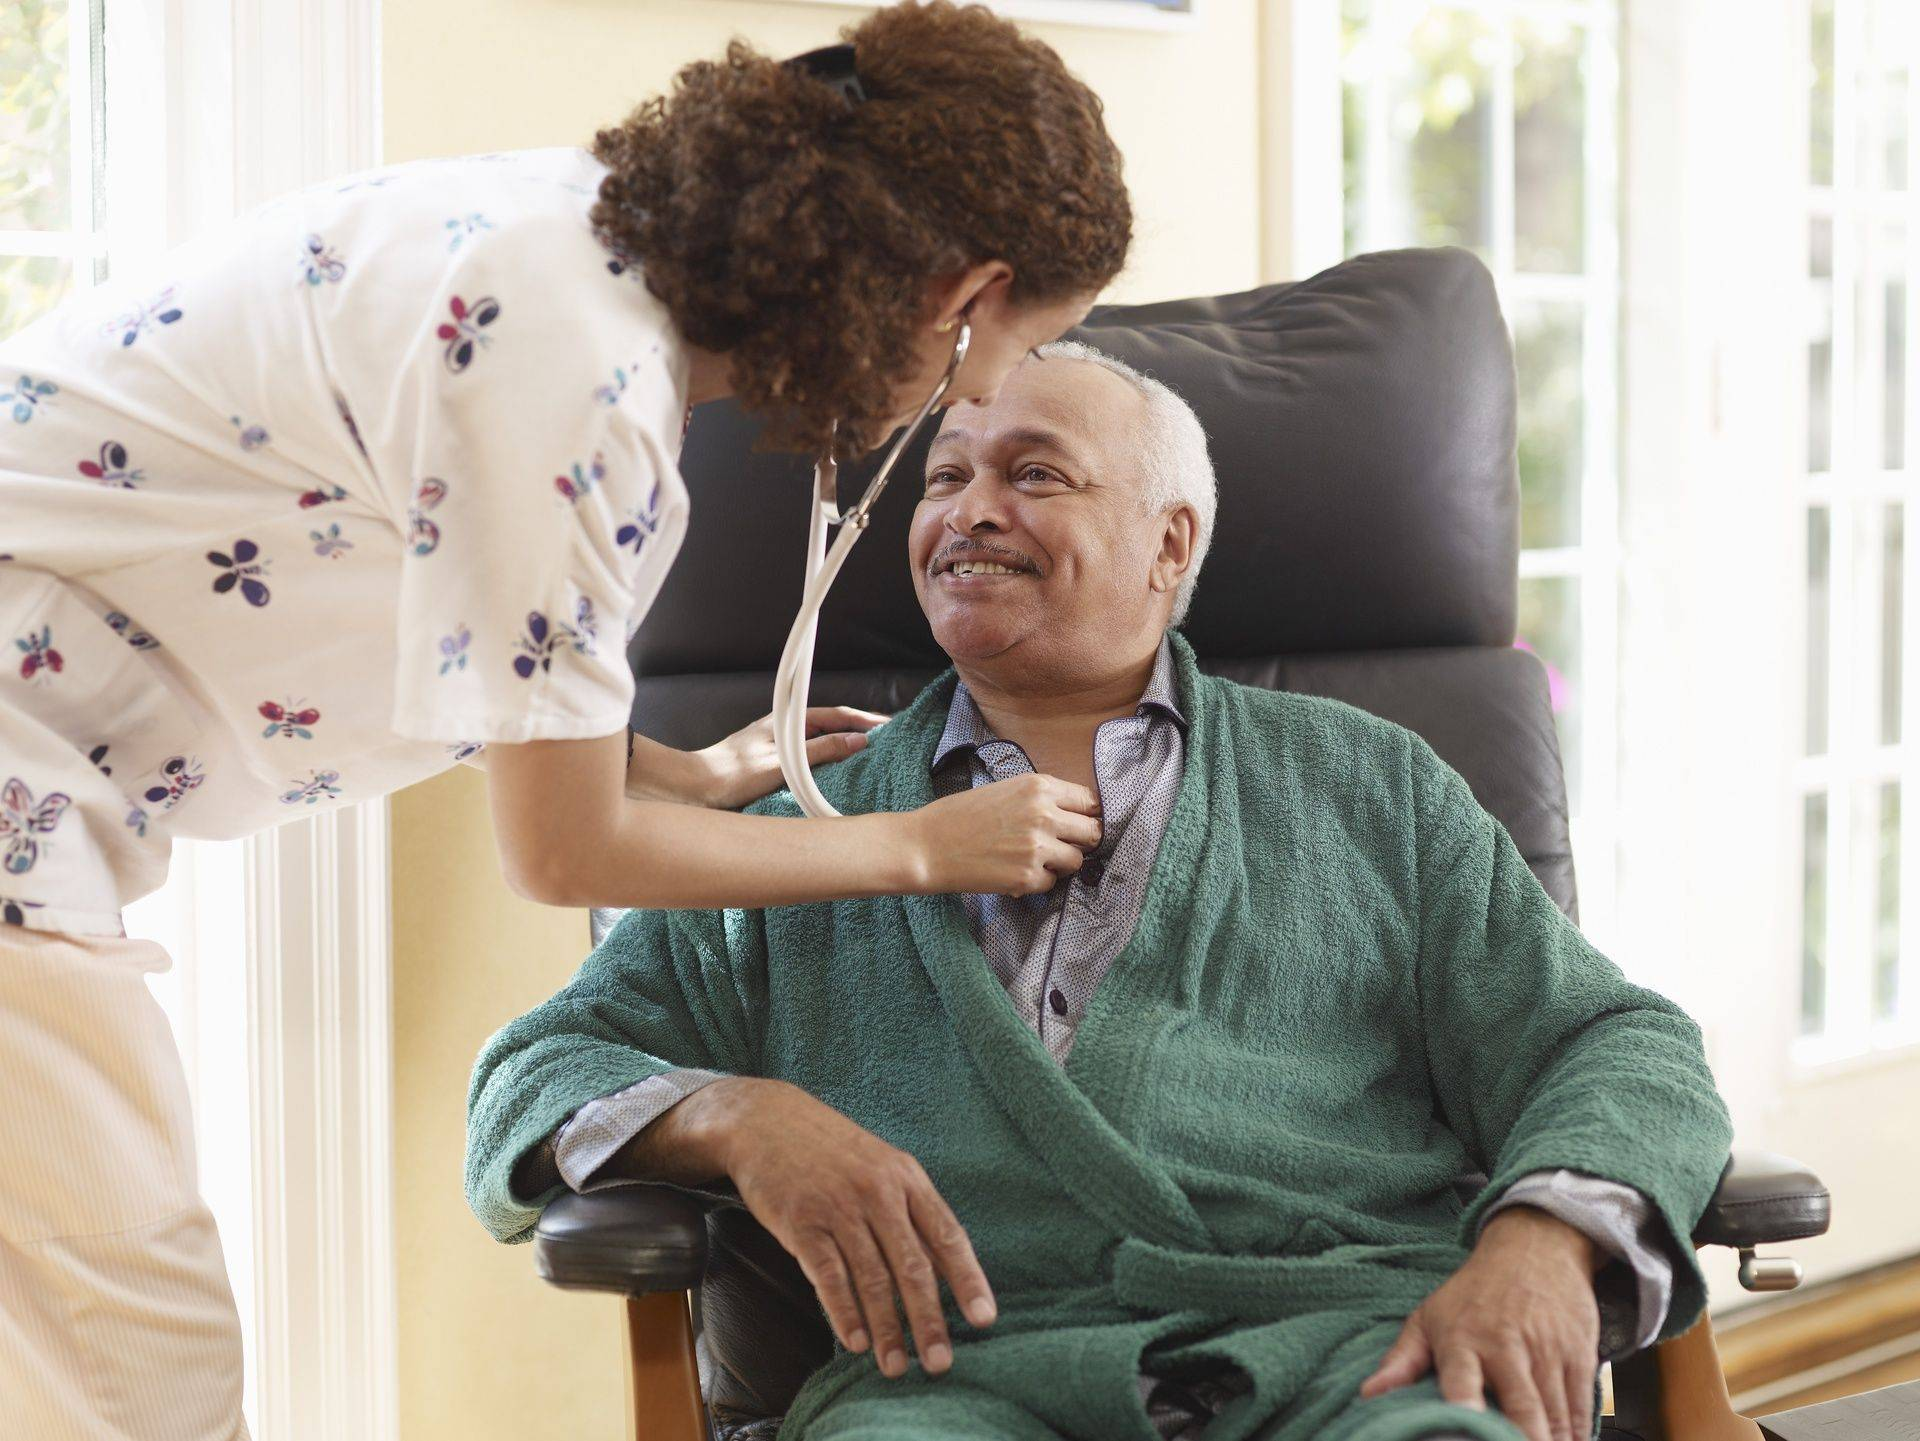 Nurse assisting the elderly man, companion care